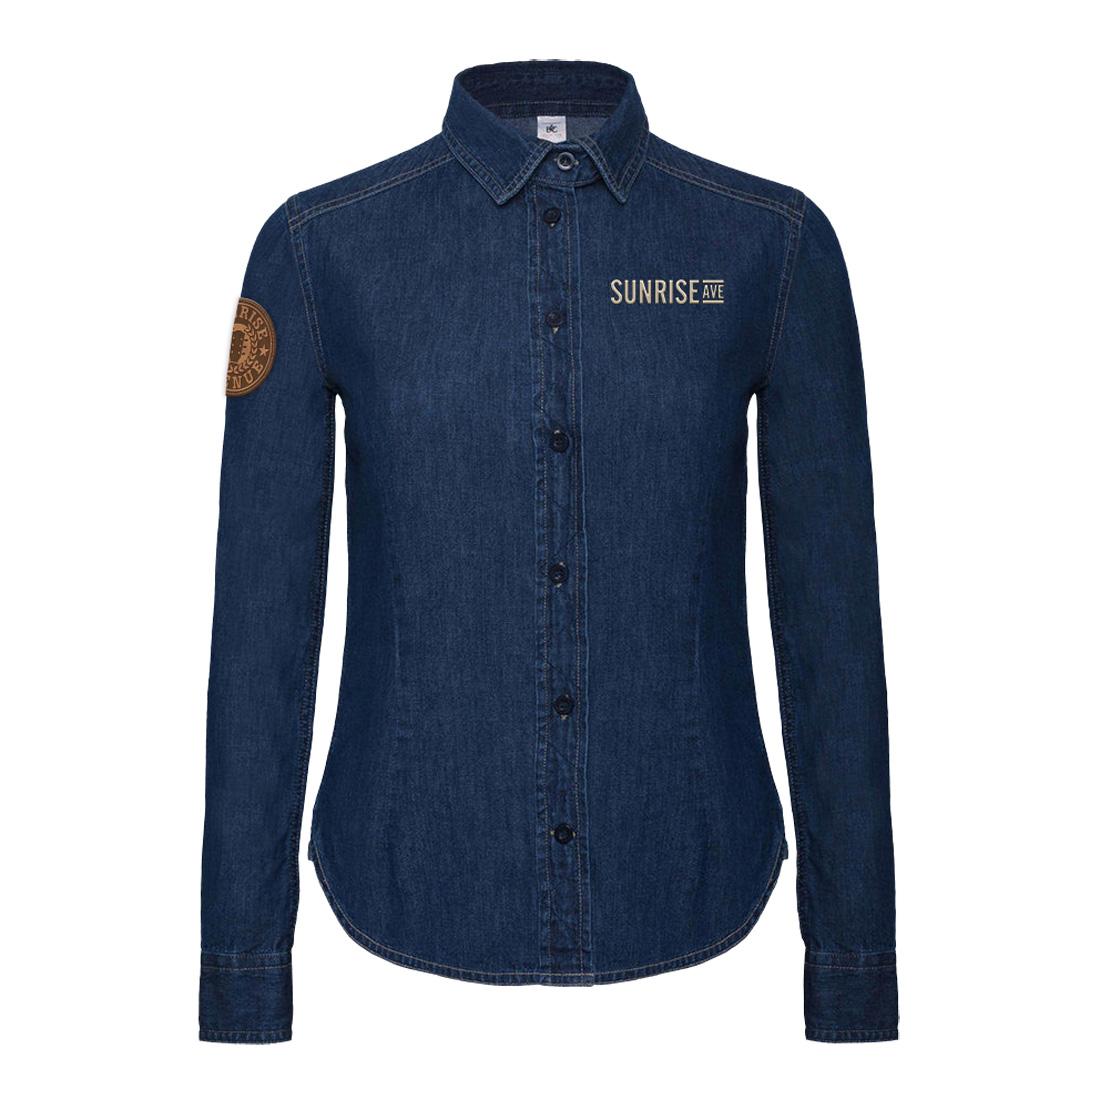 String Leaves Forever von Sunrise Avenue - Hemd jetzt im Bravado Shop